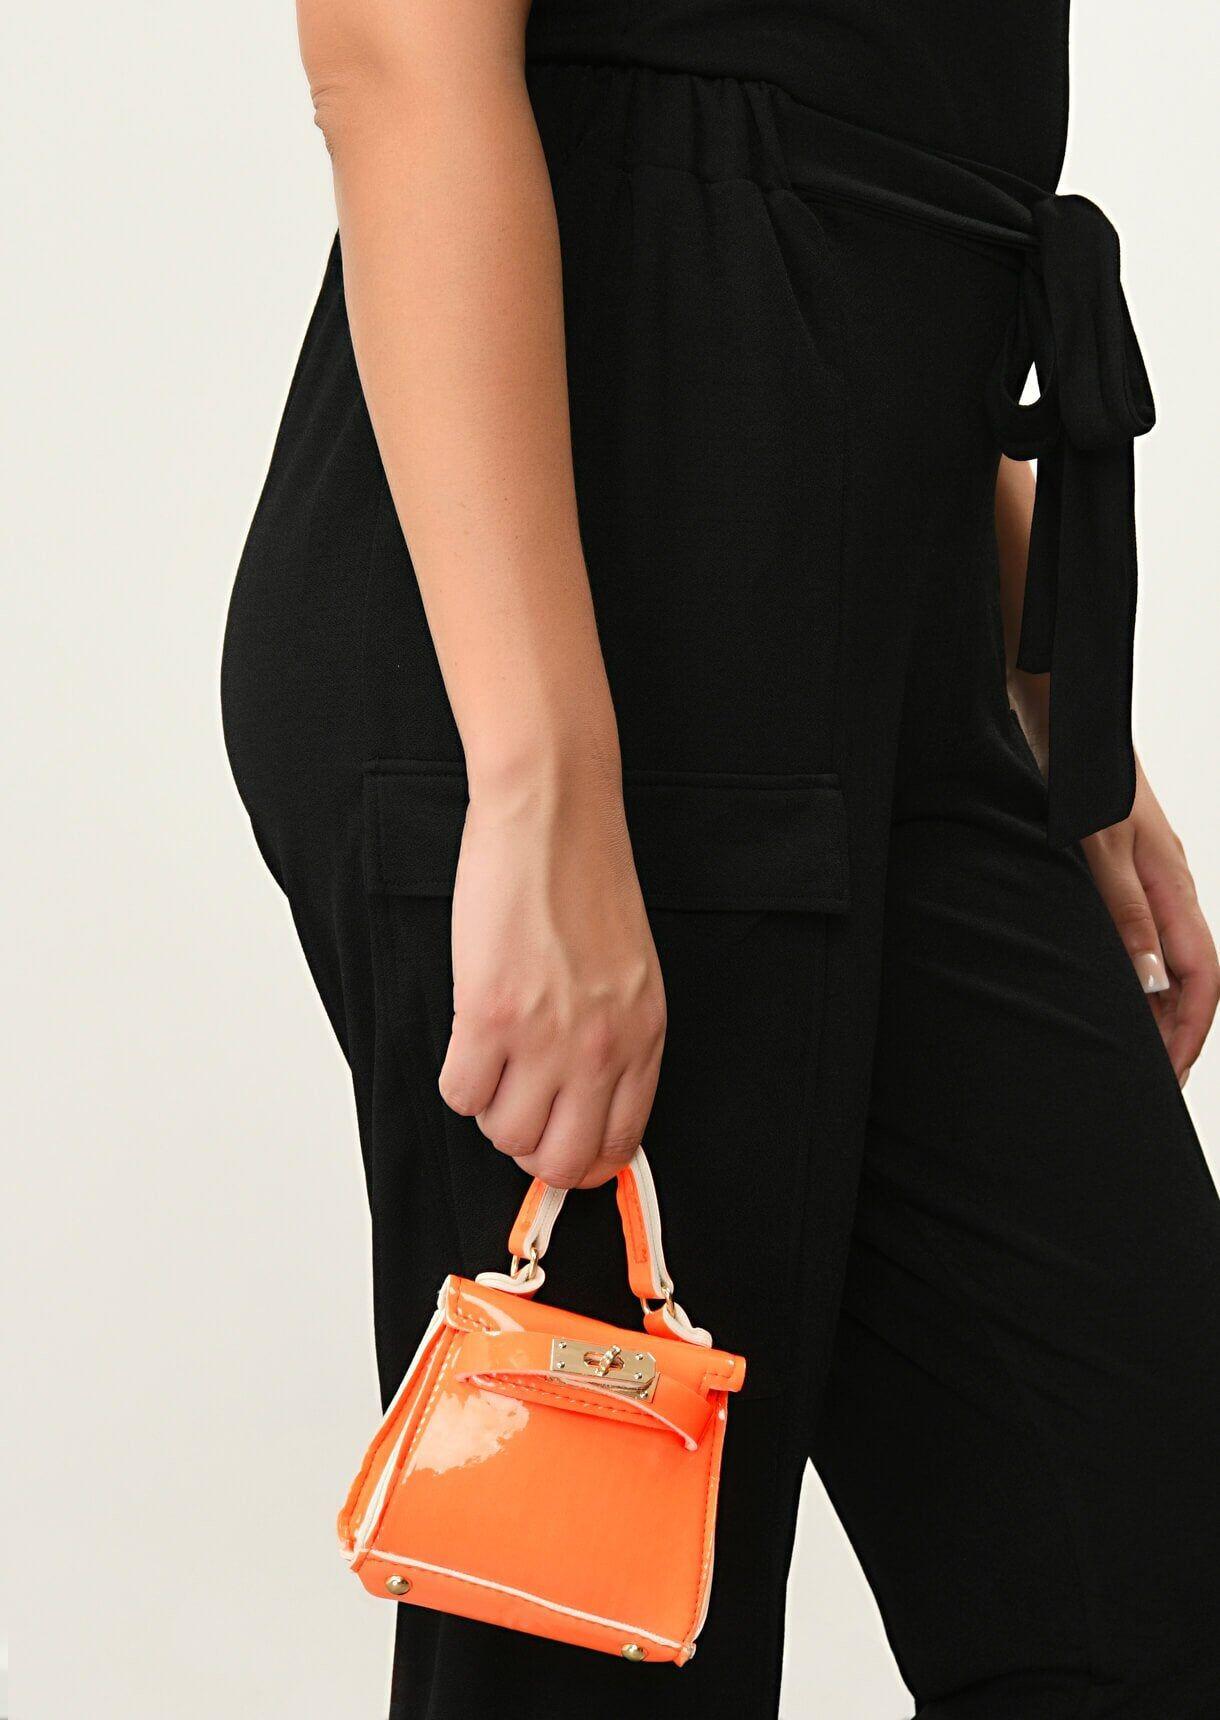 Impulse Fashion Accessories/ Gabby's Jewellery Orange Neon Croc Mini Bag